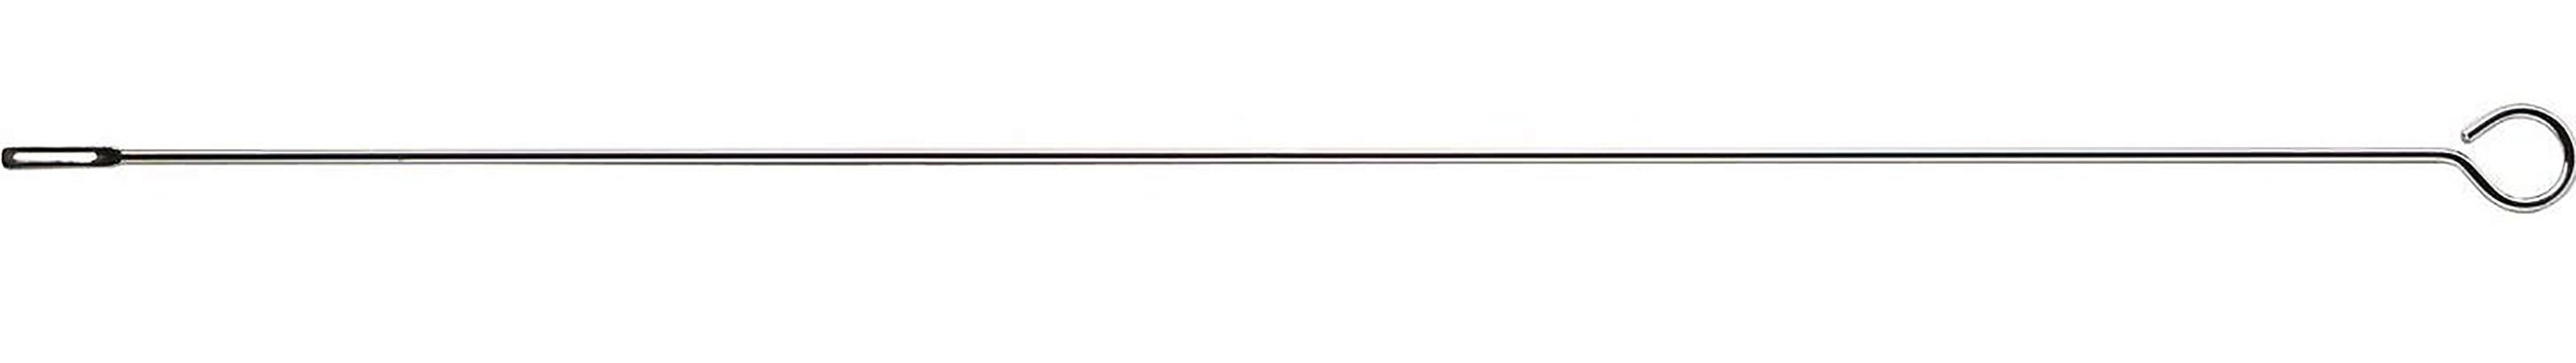 Trombone Cleaning Rod